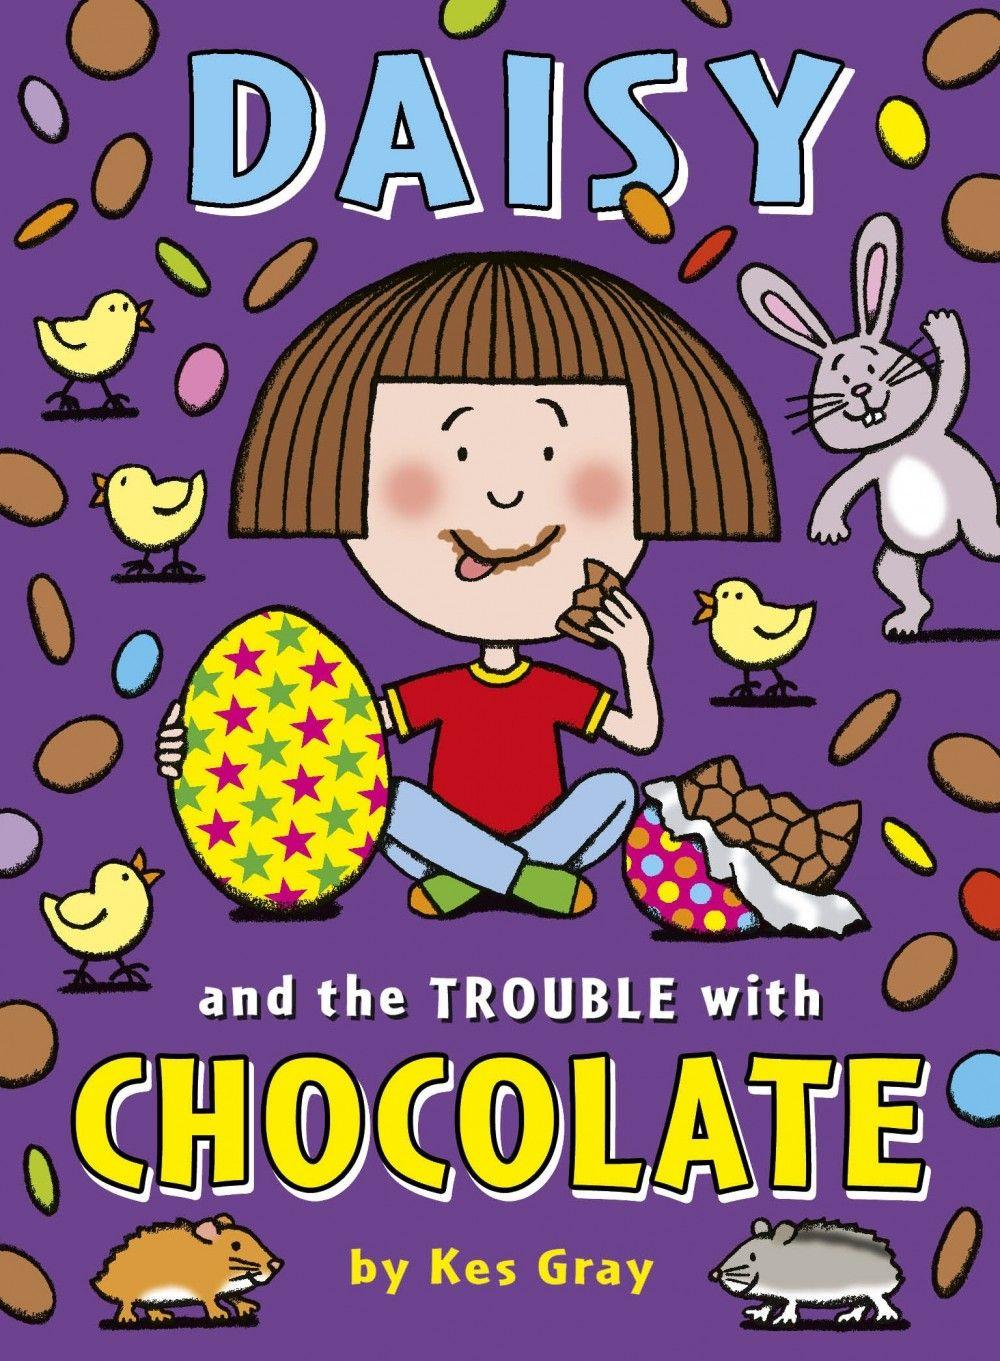 4ba78b2b9cb6 🎓 The 100 Best Children's Books of 2018